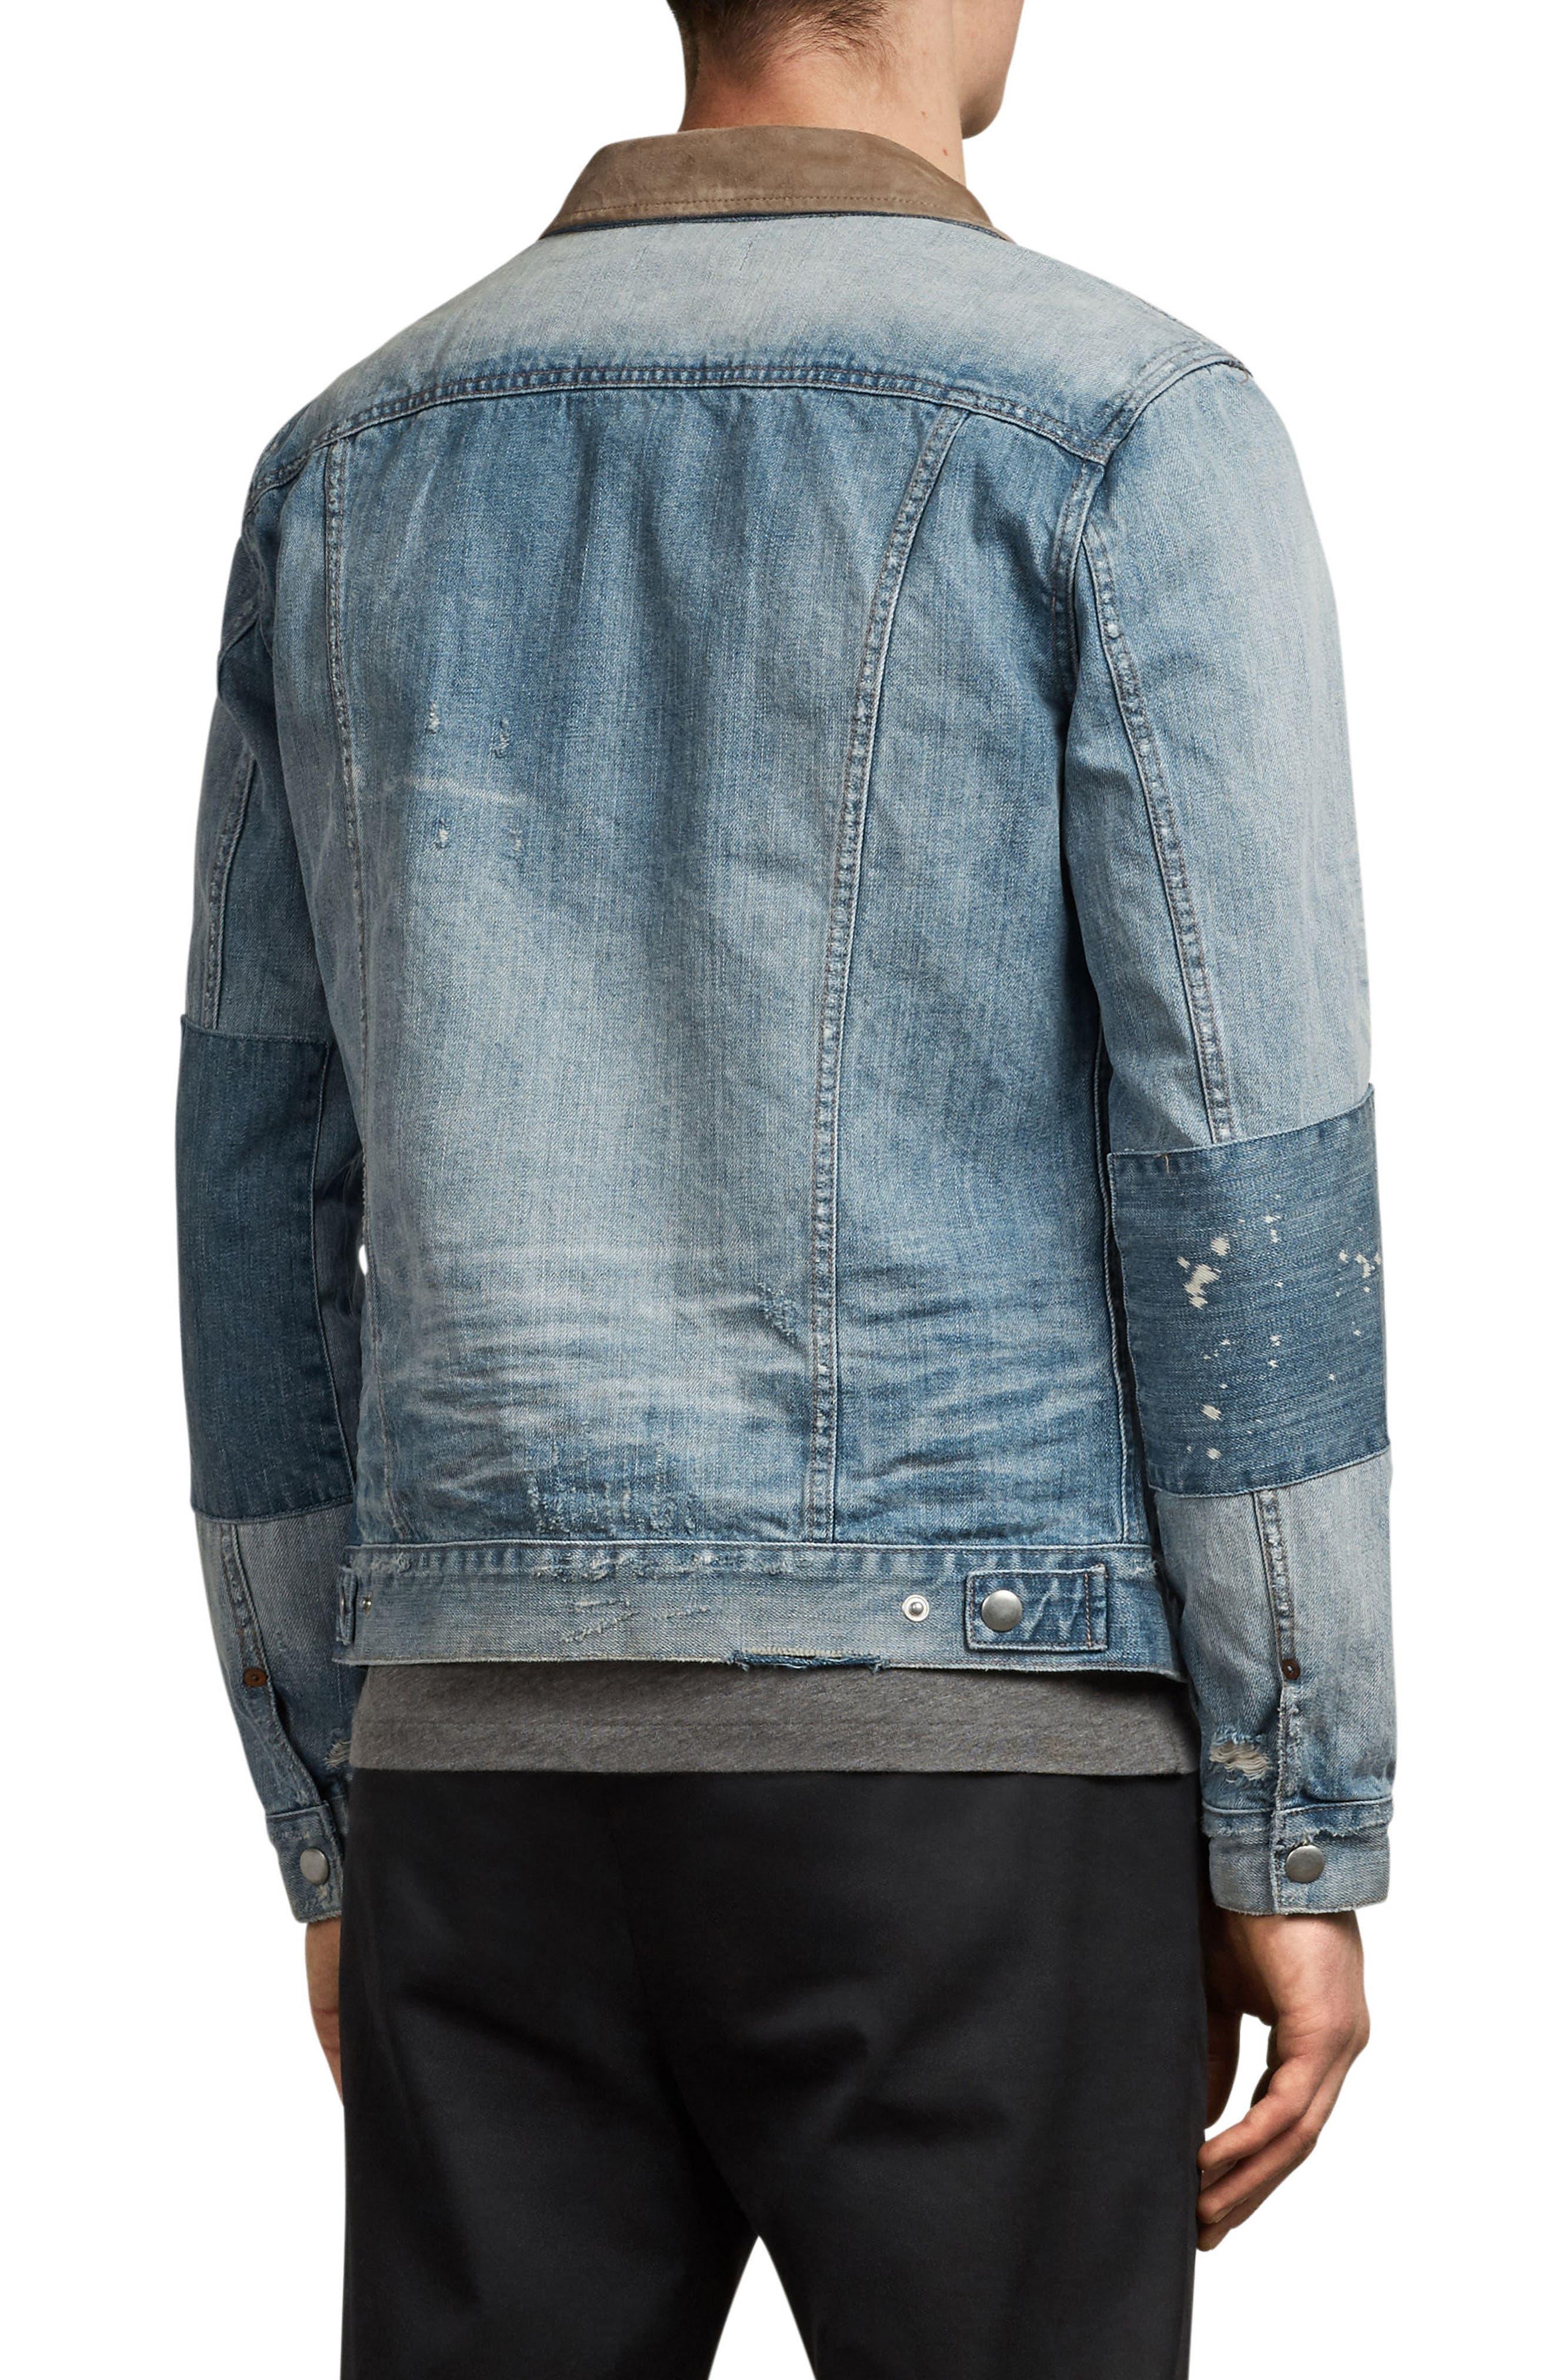 Ibanex Slim Fit Distressed Denim Jacket,                             Alternate thumbnail 2, color,                             460